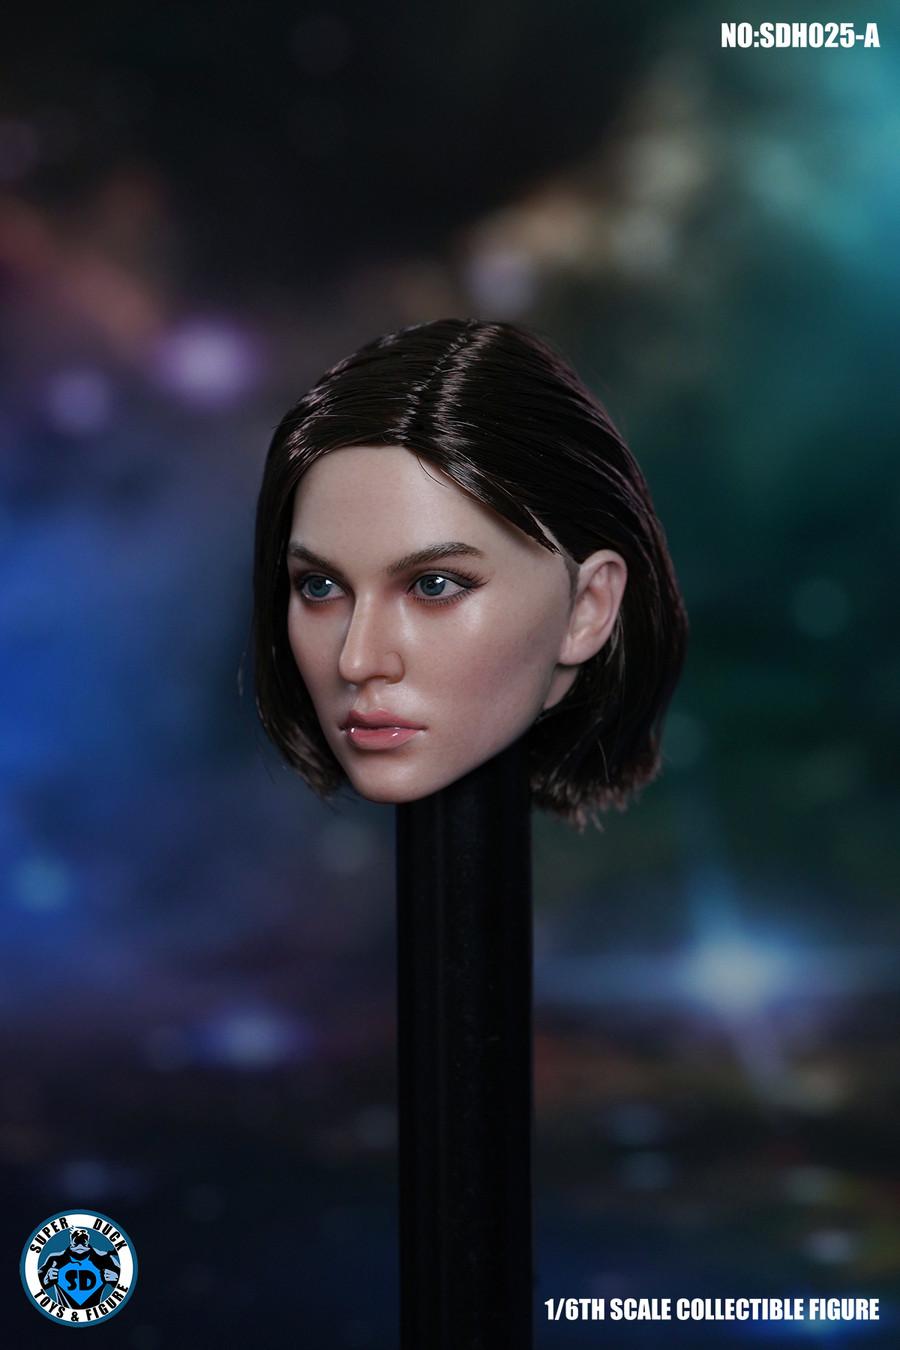 Super Duck - Russian Model Headsculpt SUDSDH025